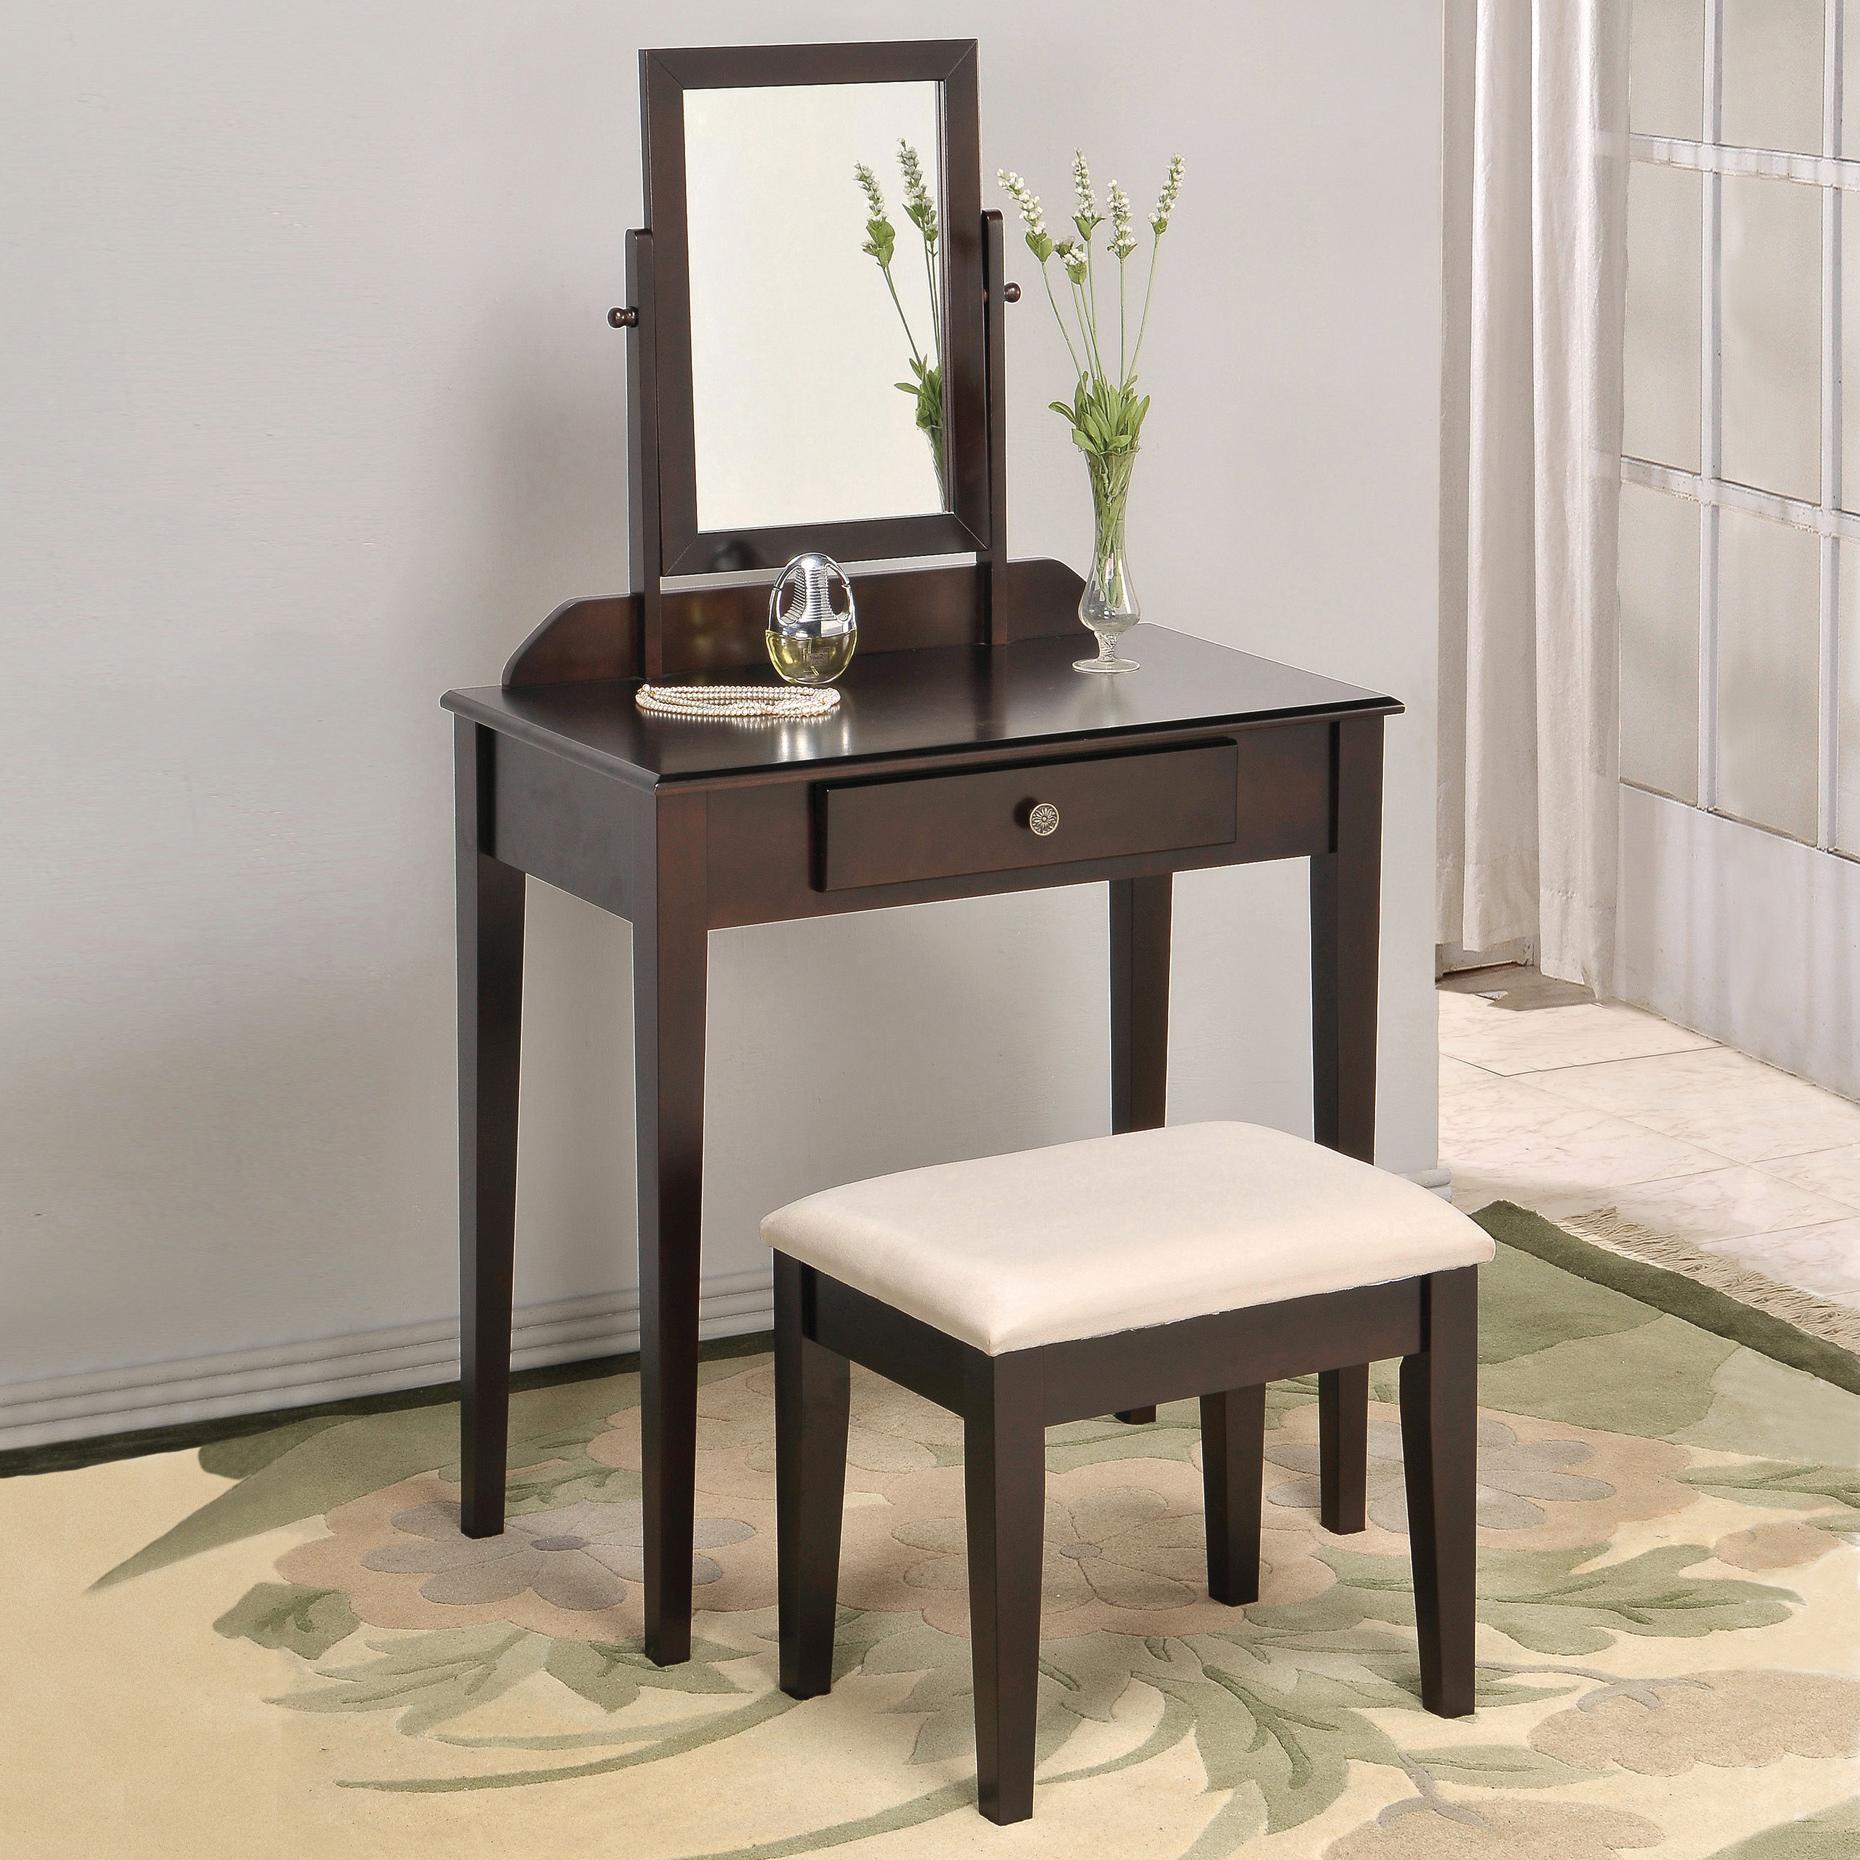 Iris Vanity Table & Stool by Crown Mark at Darvin Furniture